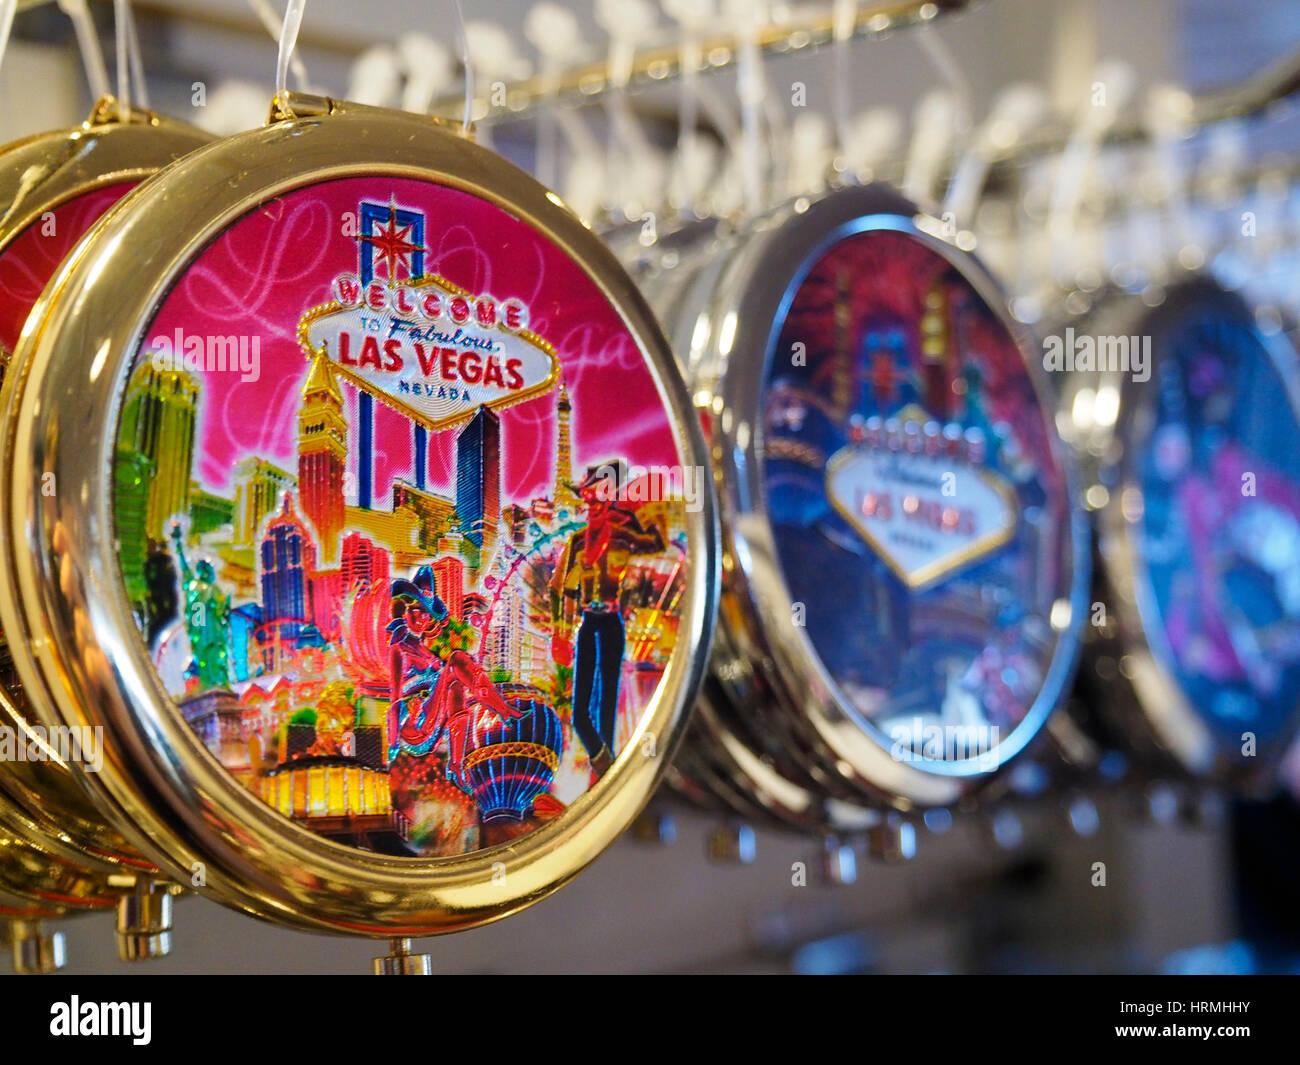 Las Vegas key chain souvenirs in a shop in Las Vegas - Stock Image